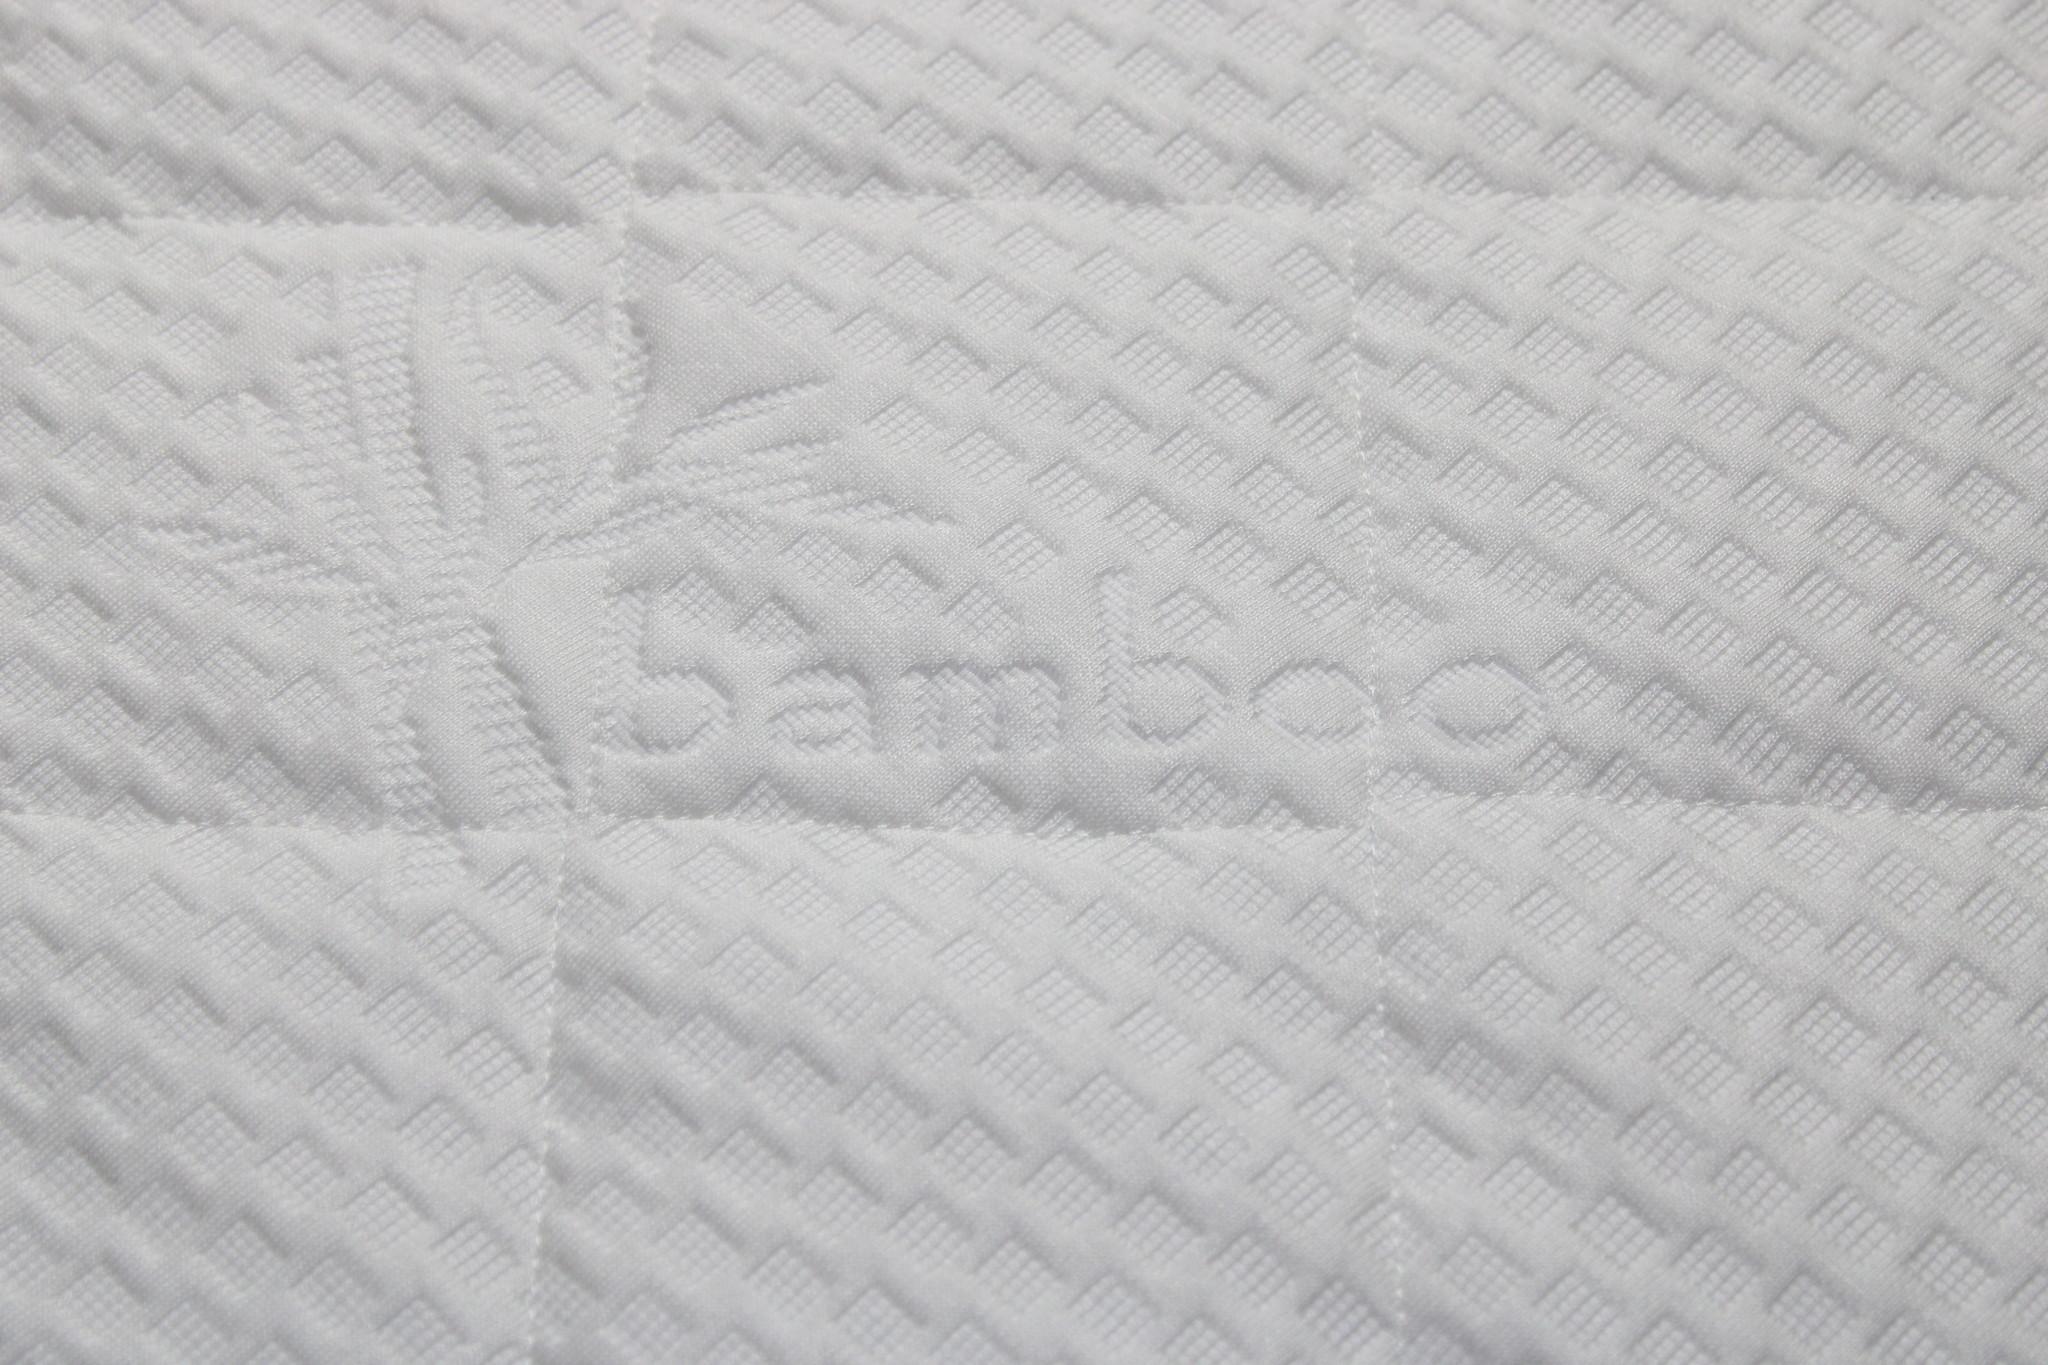 Sarpy Kindermatras 80x200 koudschuim hr40 bamboo